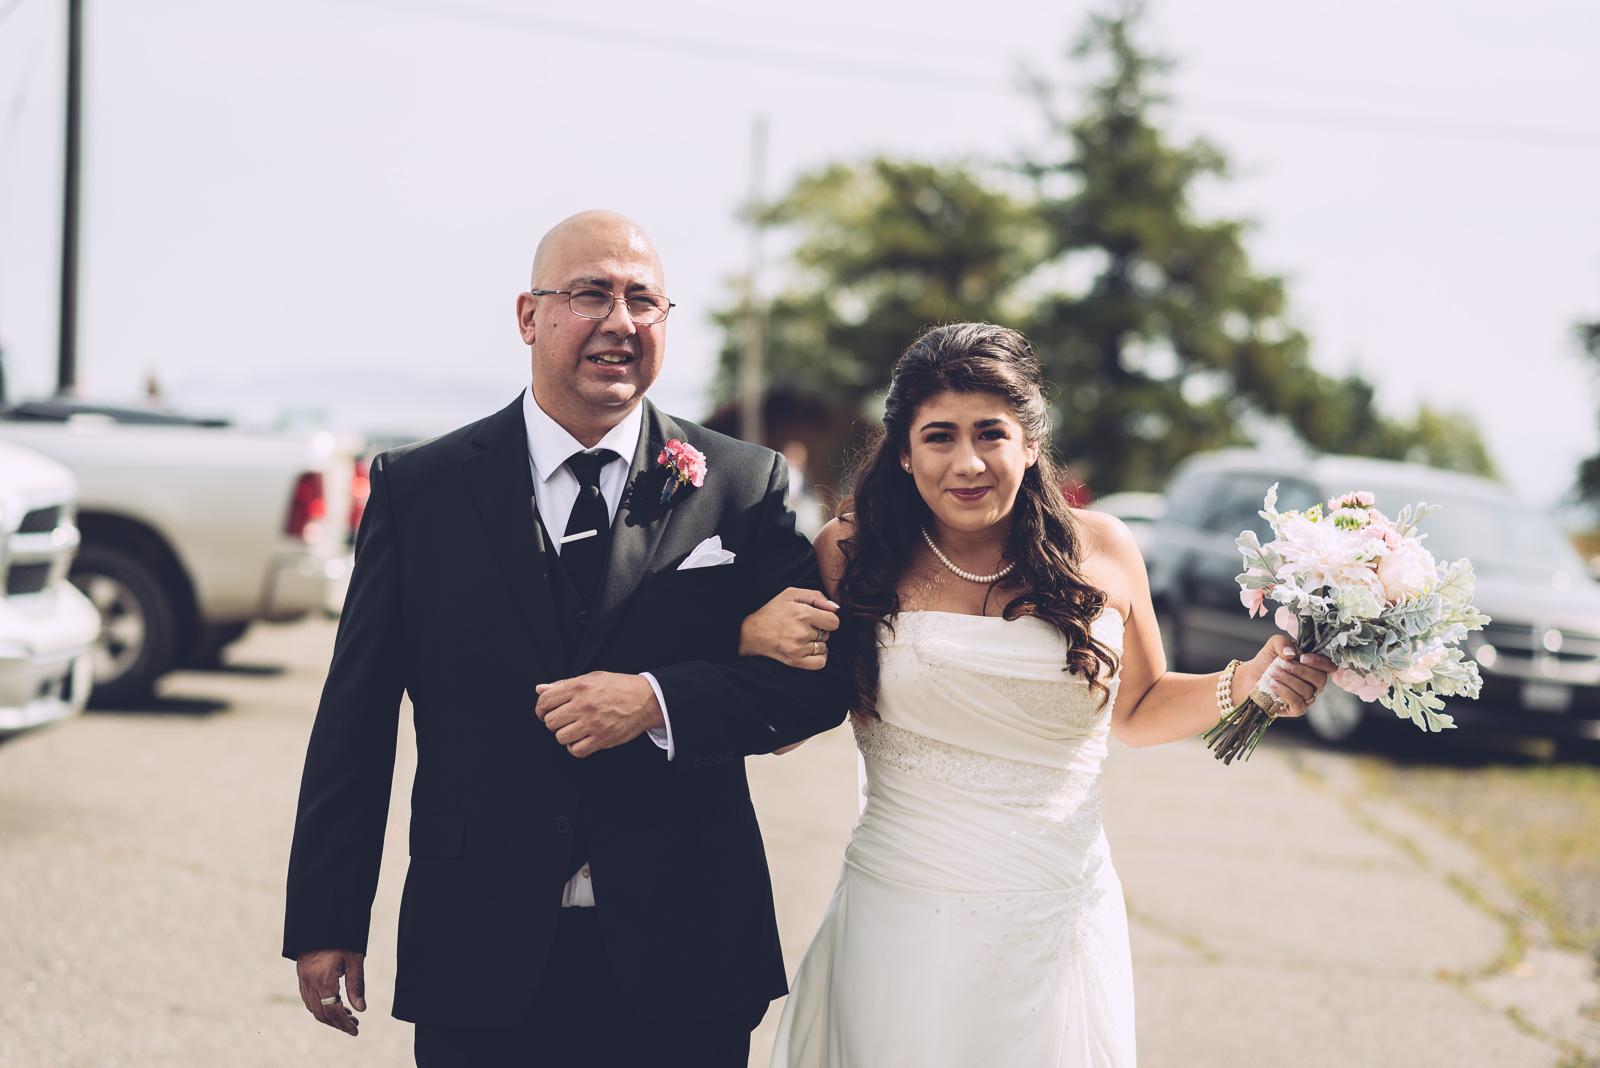 jamie_cory_wedding_blog32.jpg